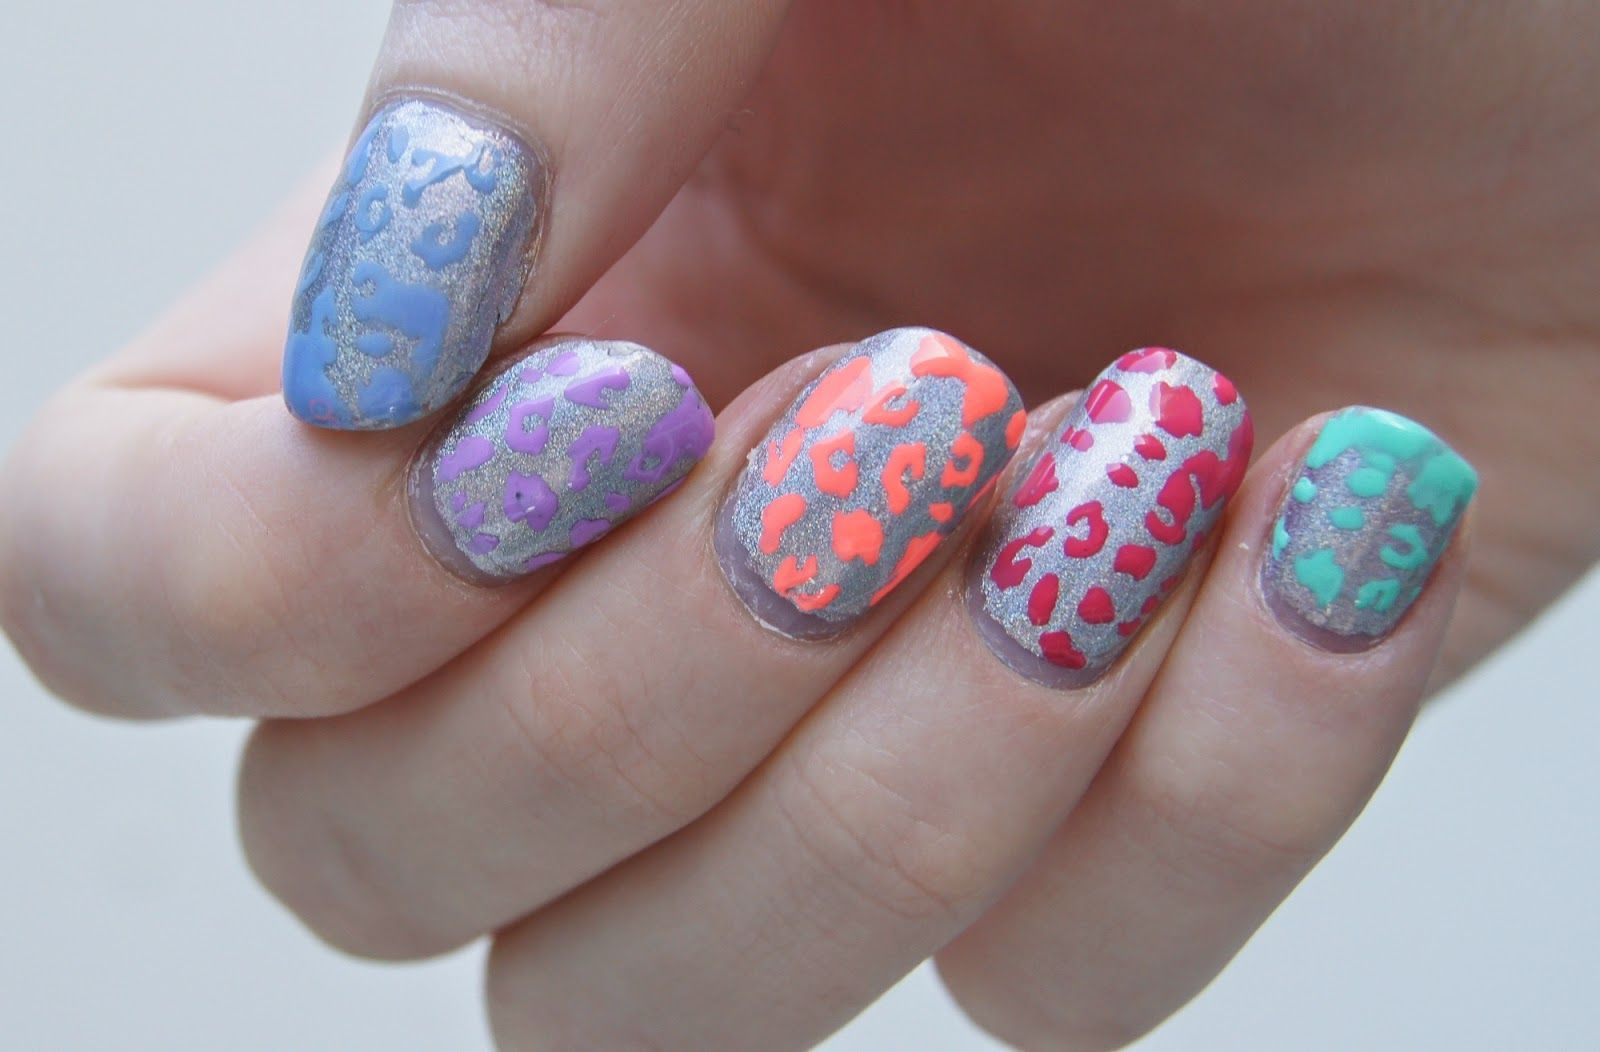 Leopard nails colors nail art uÑas pinterest leopard nails